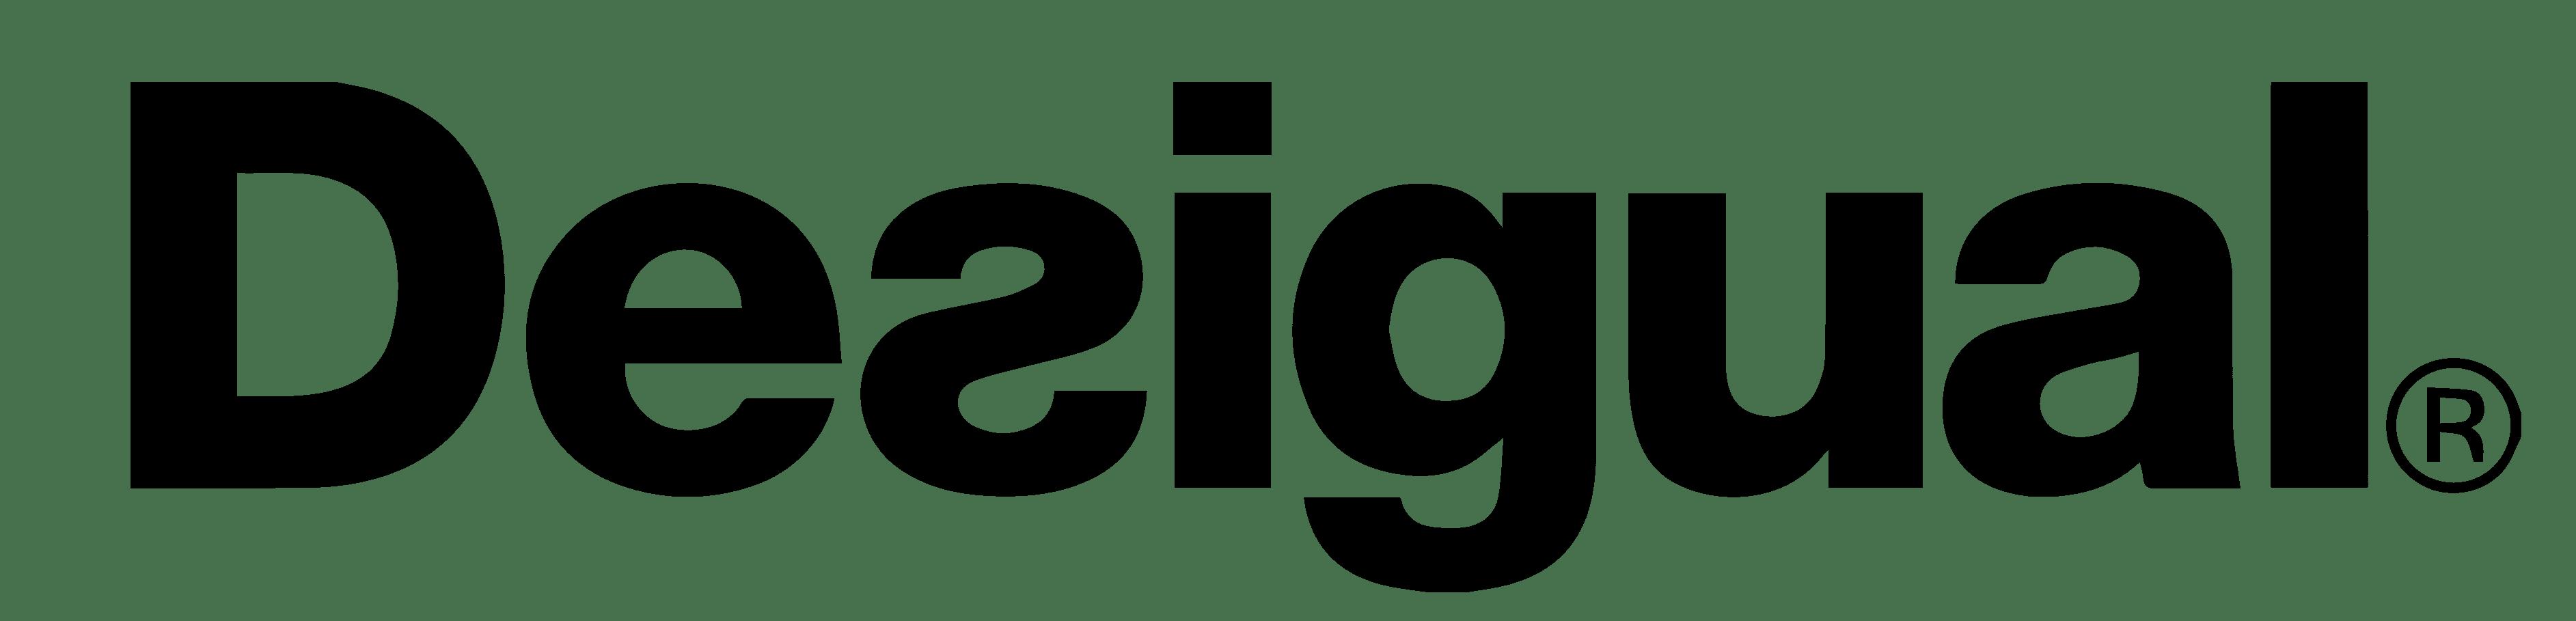 Desigual Logo transparent PNG.